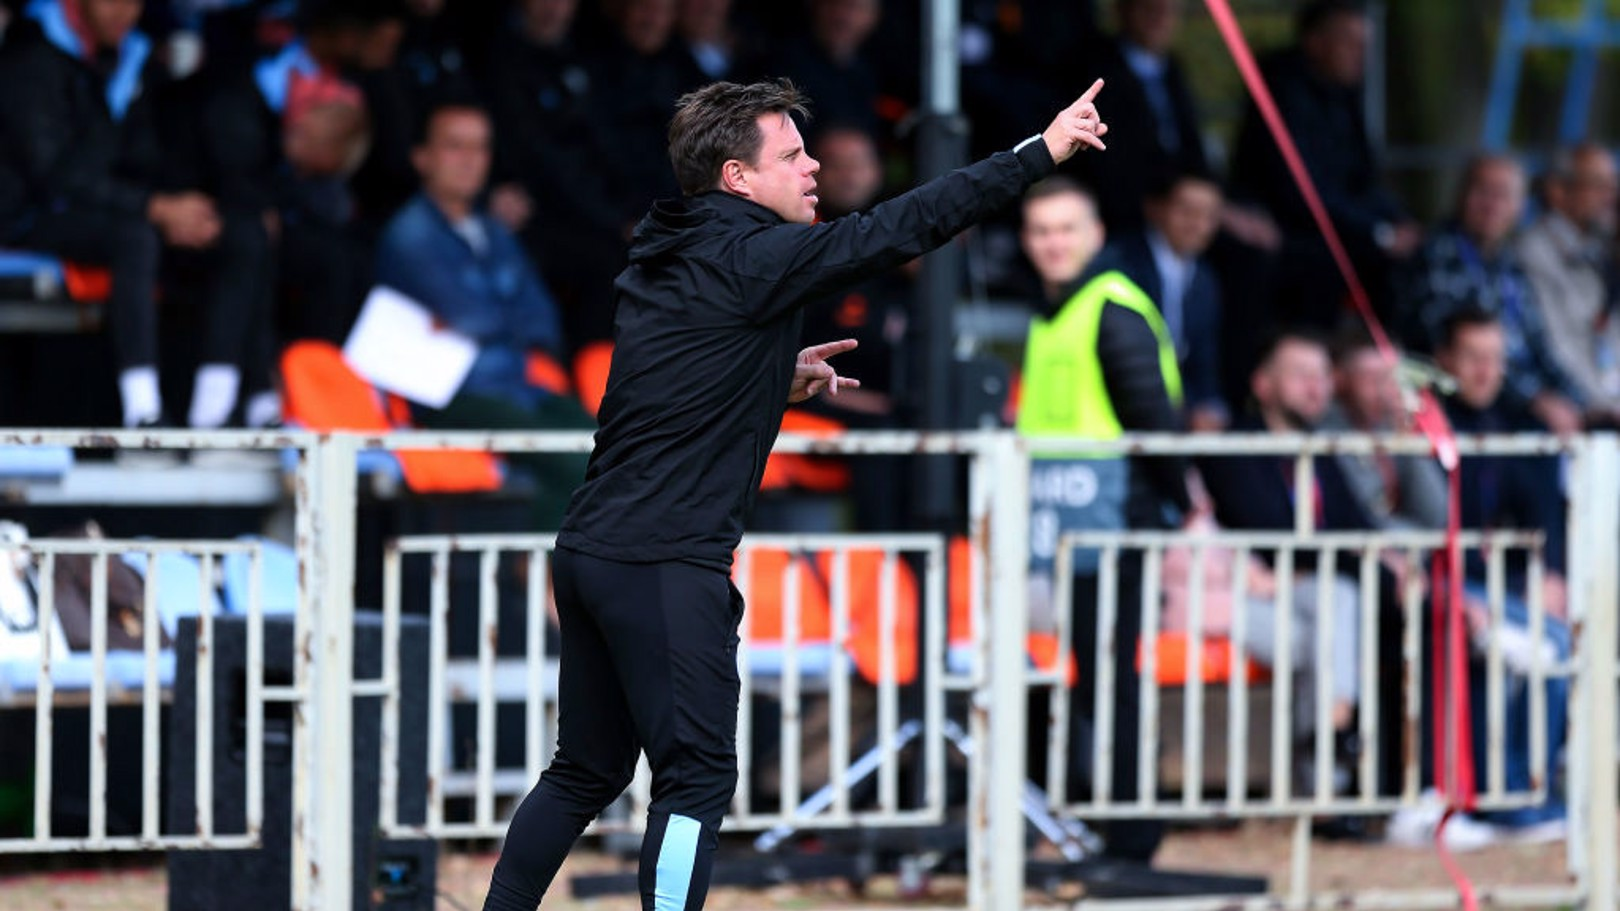 INSTRUCTIONS: Paul Harsley on the sideline against Shakhtar Donetsk.